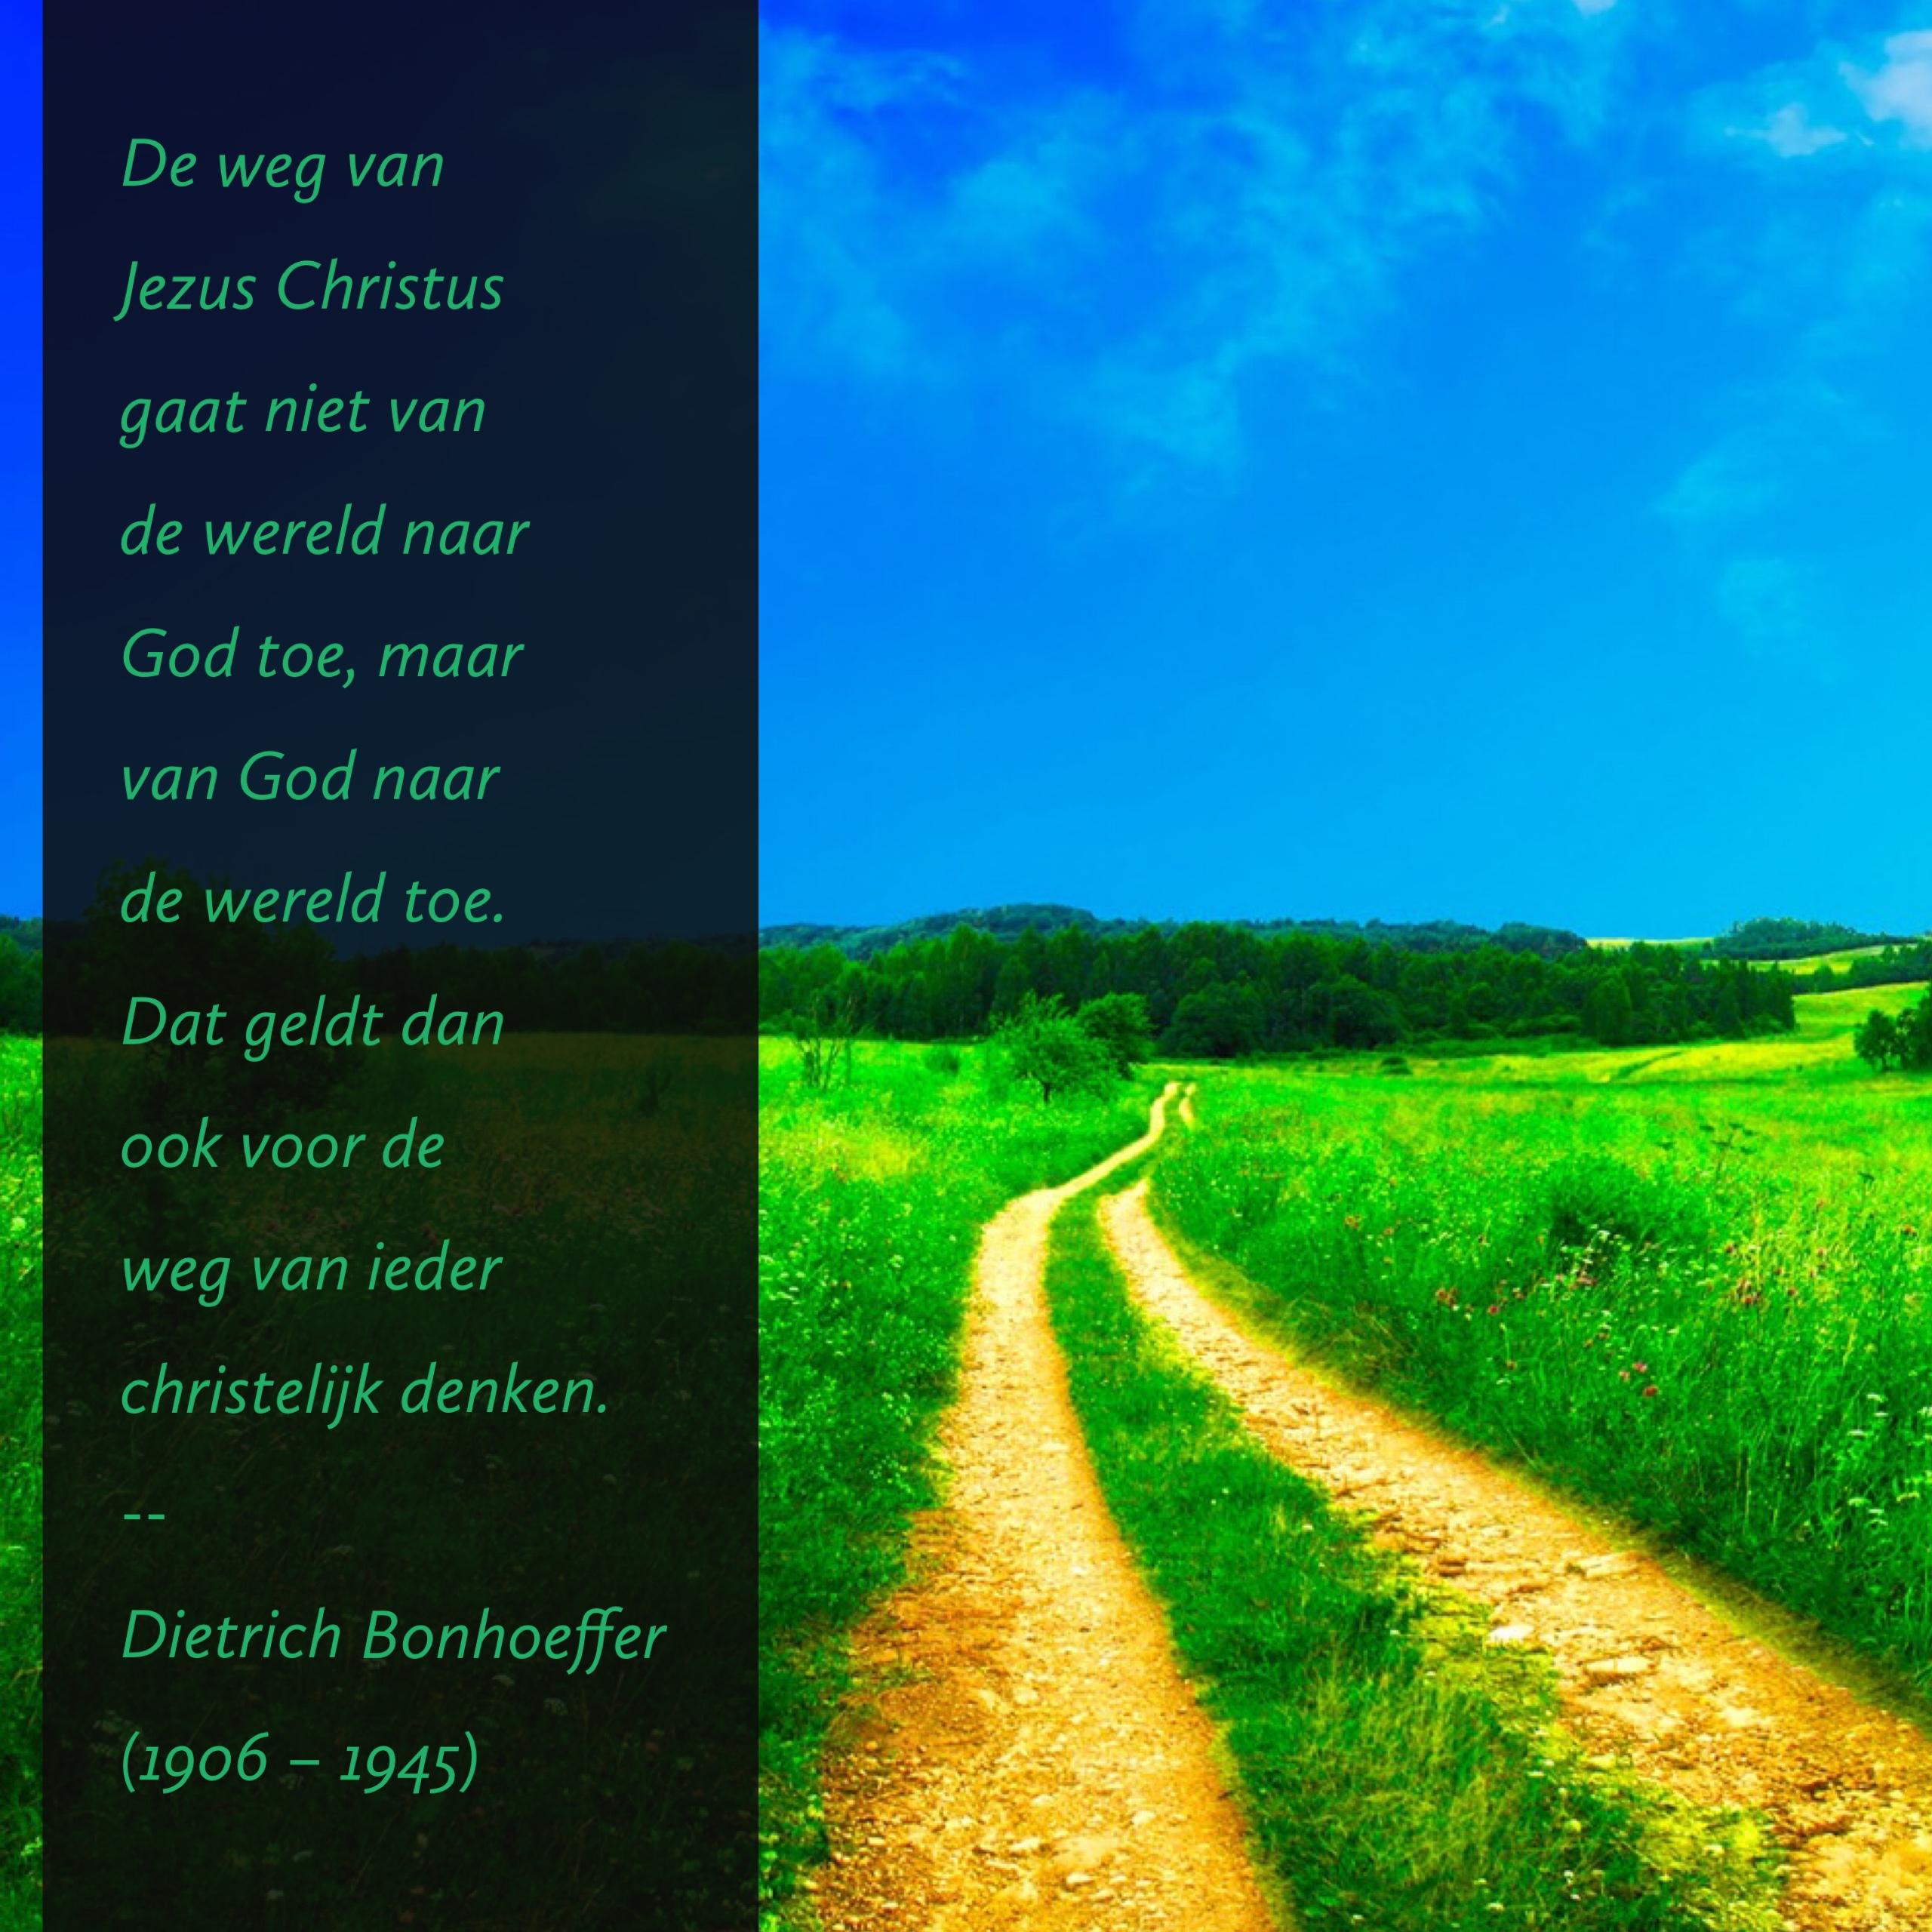 Citaten Jezus : De weg van jezus christus